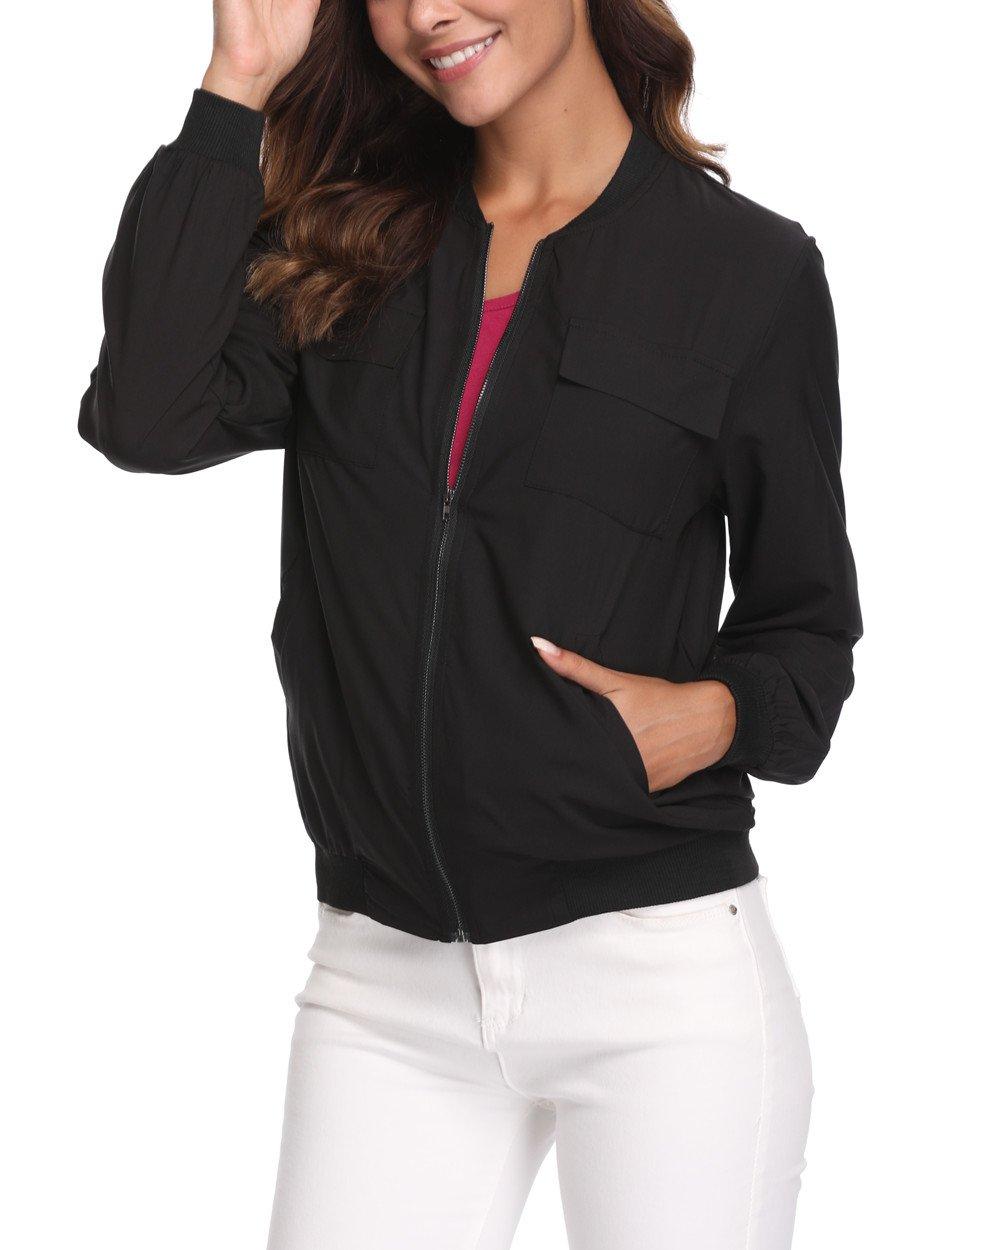 MISS MOLY Women's Lightweight Jackets Zip Up Coat Rib Collar Multi-Pockets Summer Windbreaker Bomber Jacket Outwear